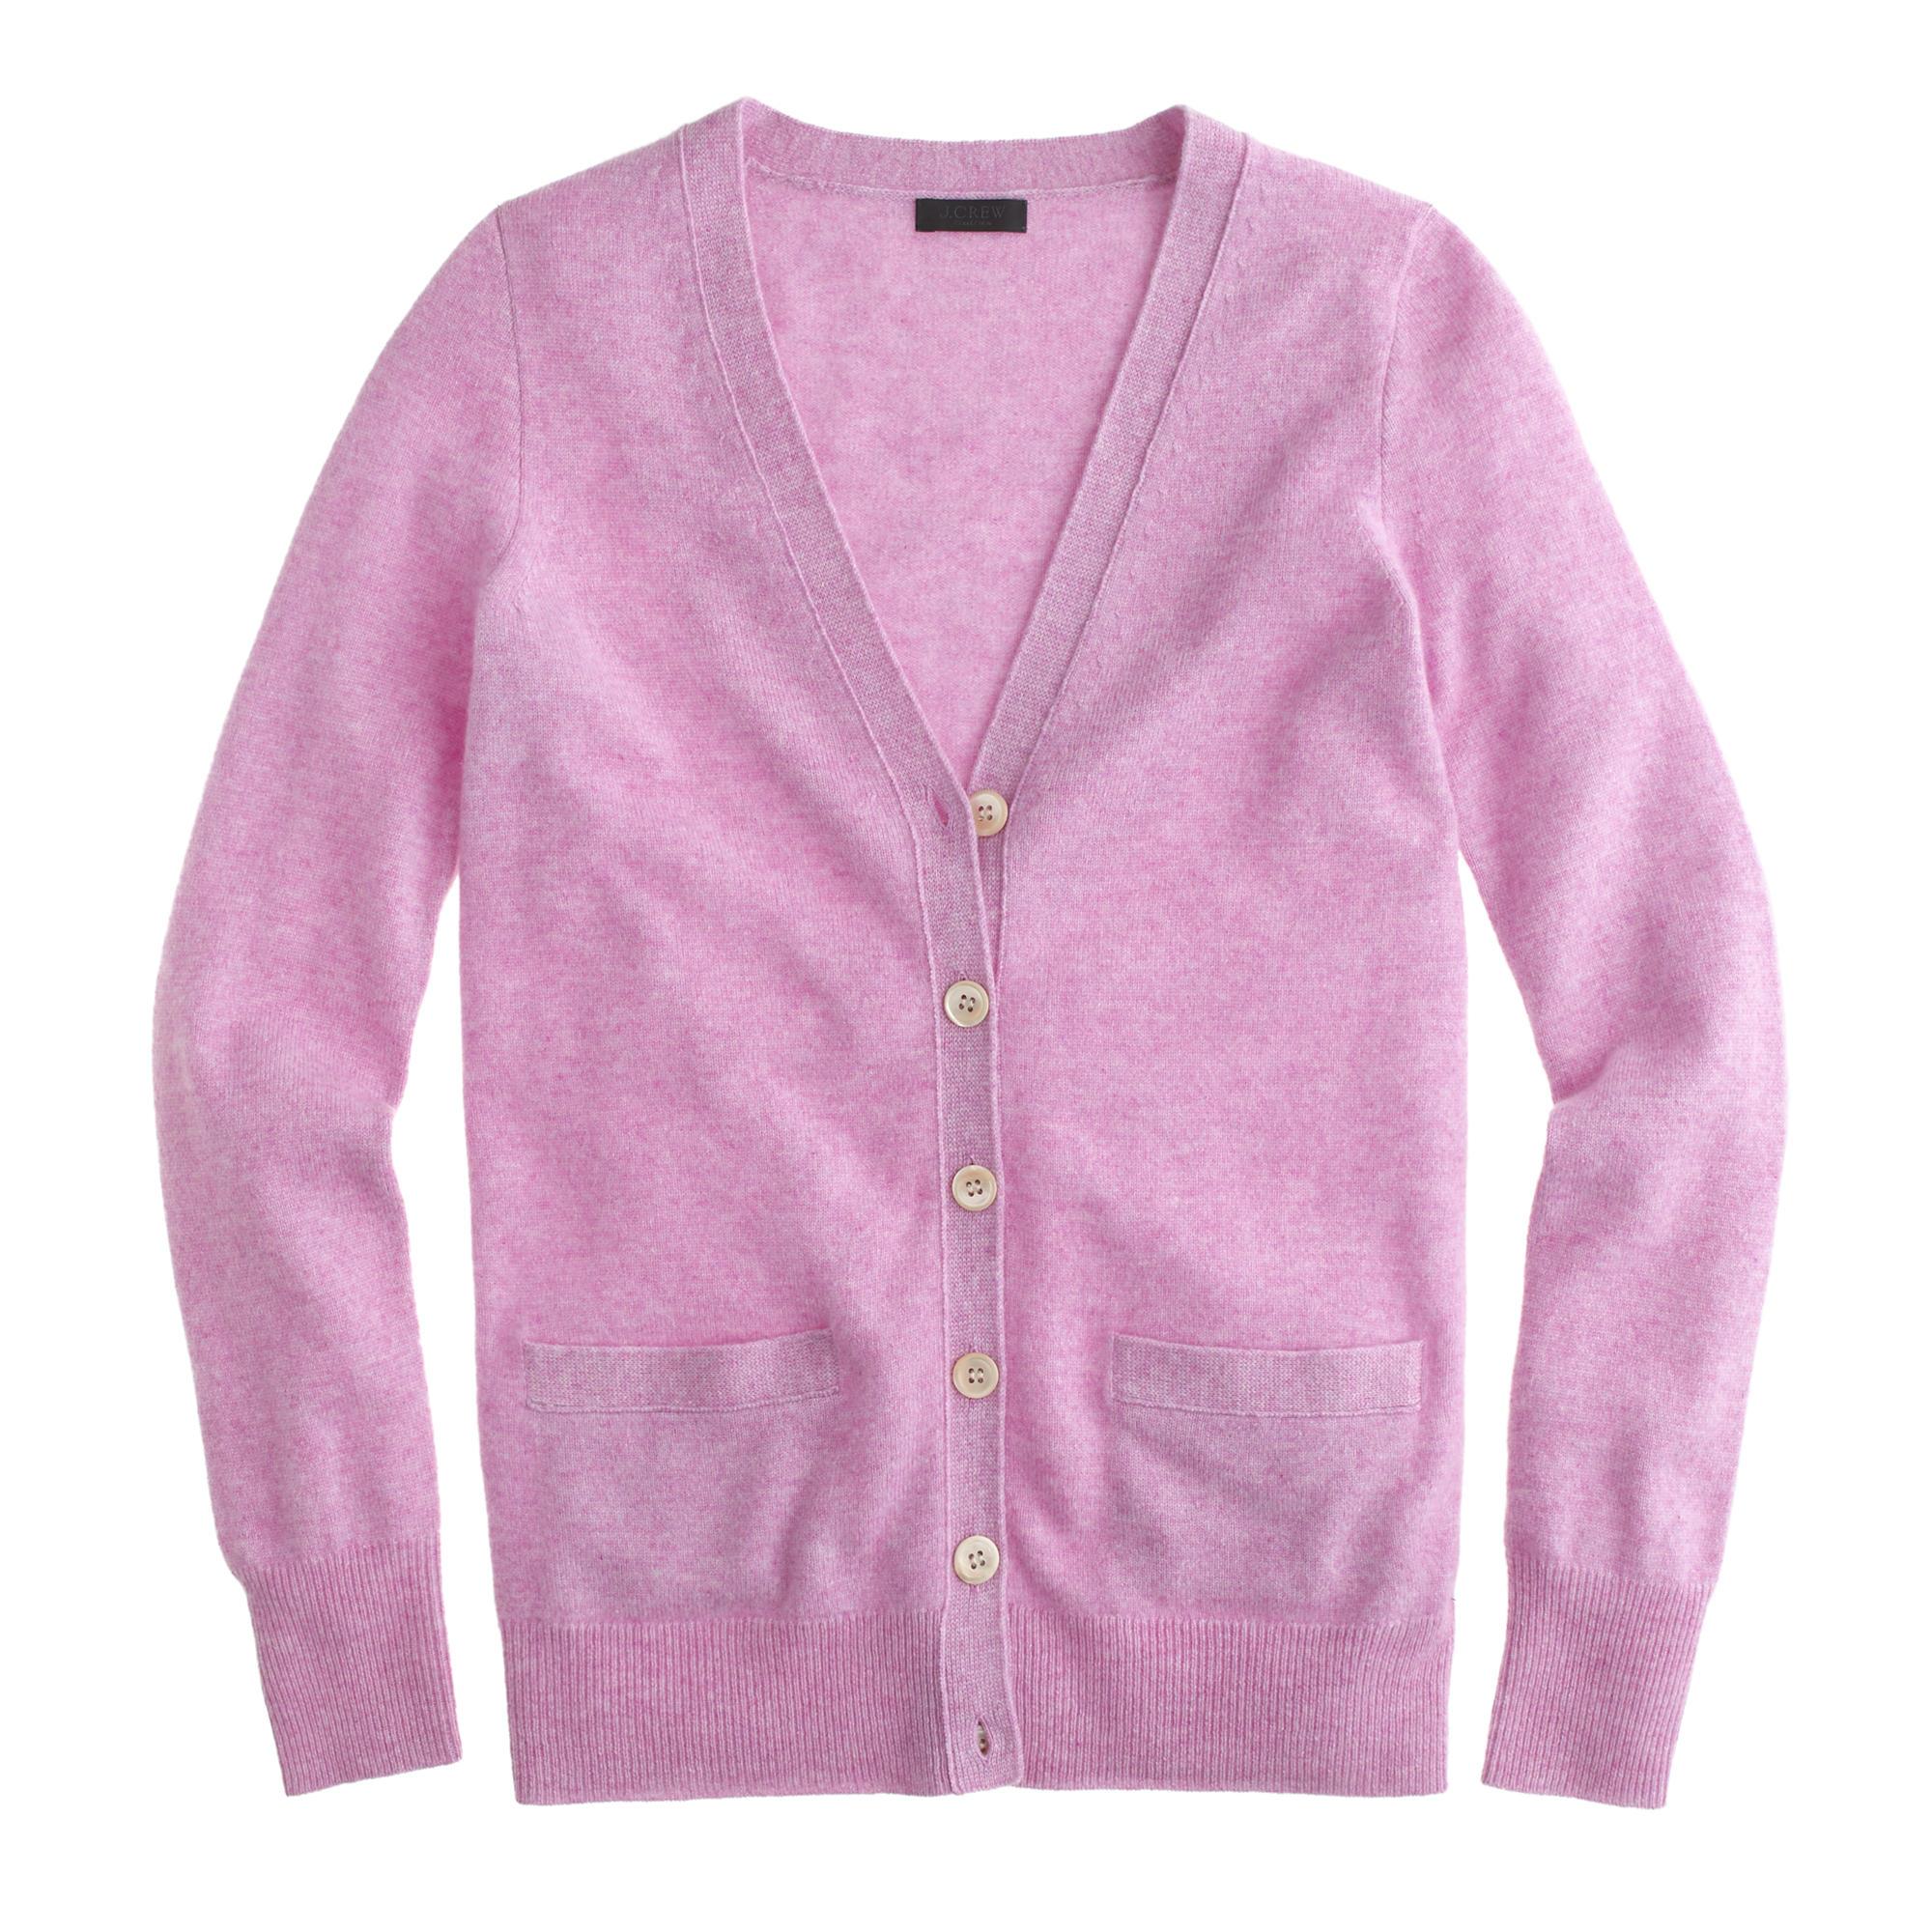 J.crew Collection Cashmere Boyfriend Cardigan Sweater in Purple | Lyst